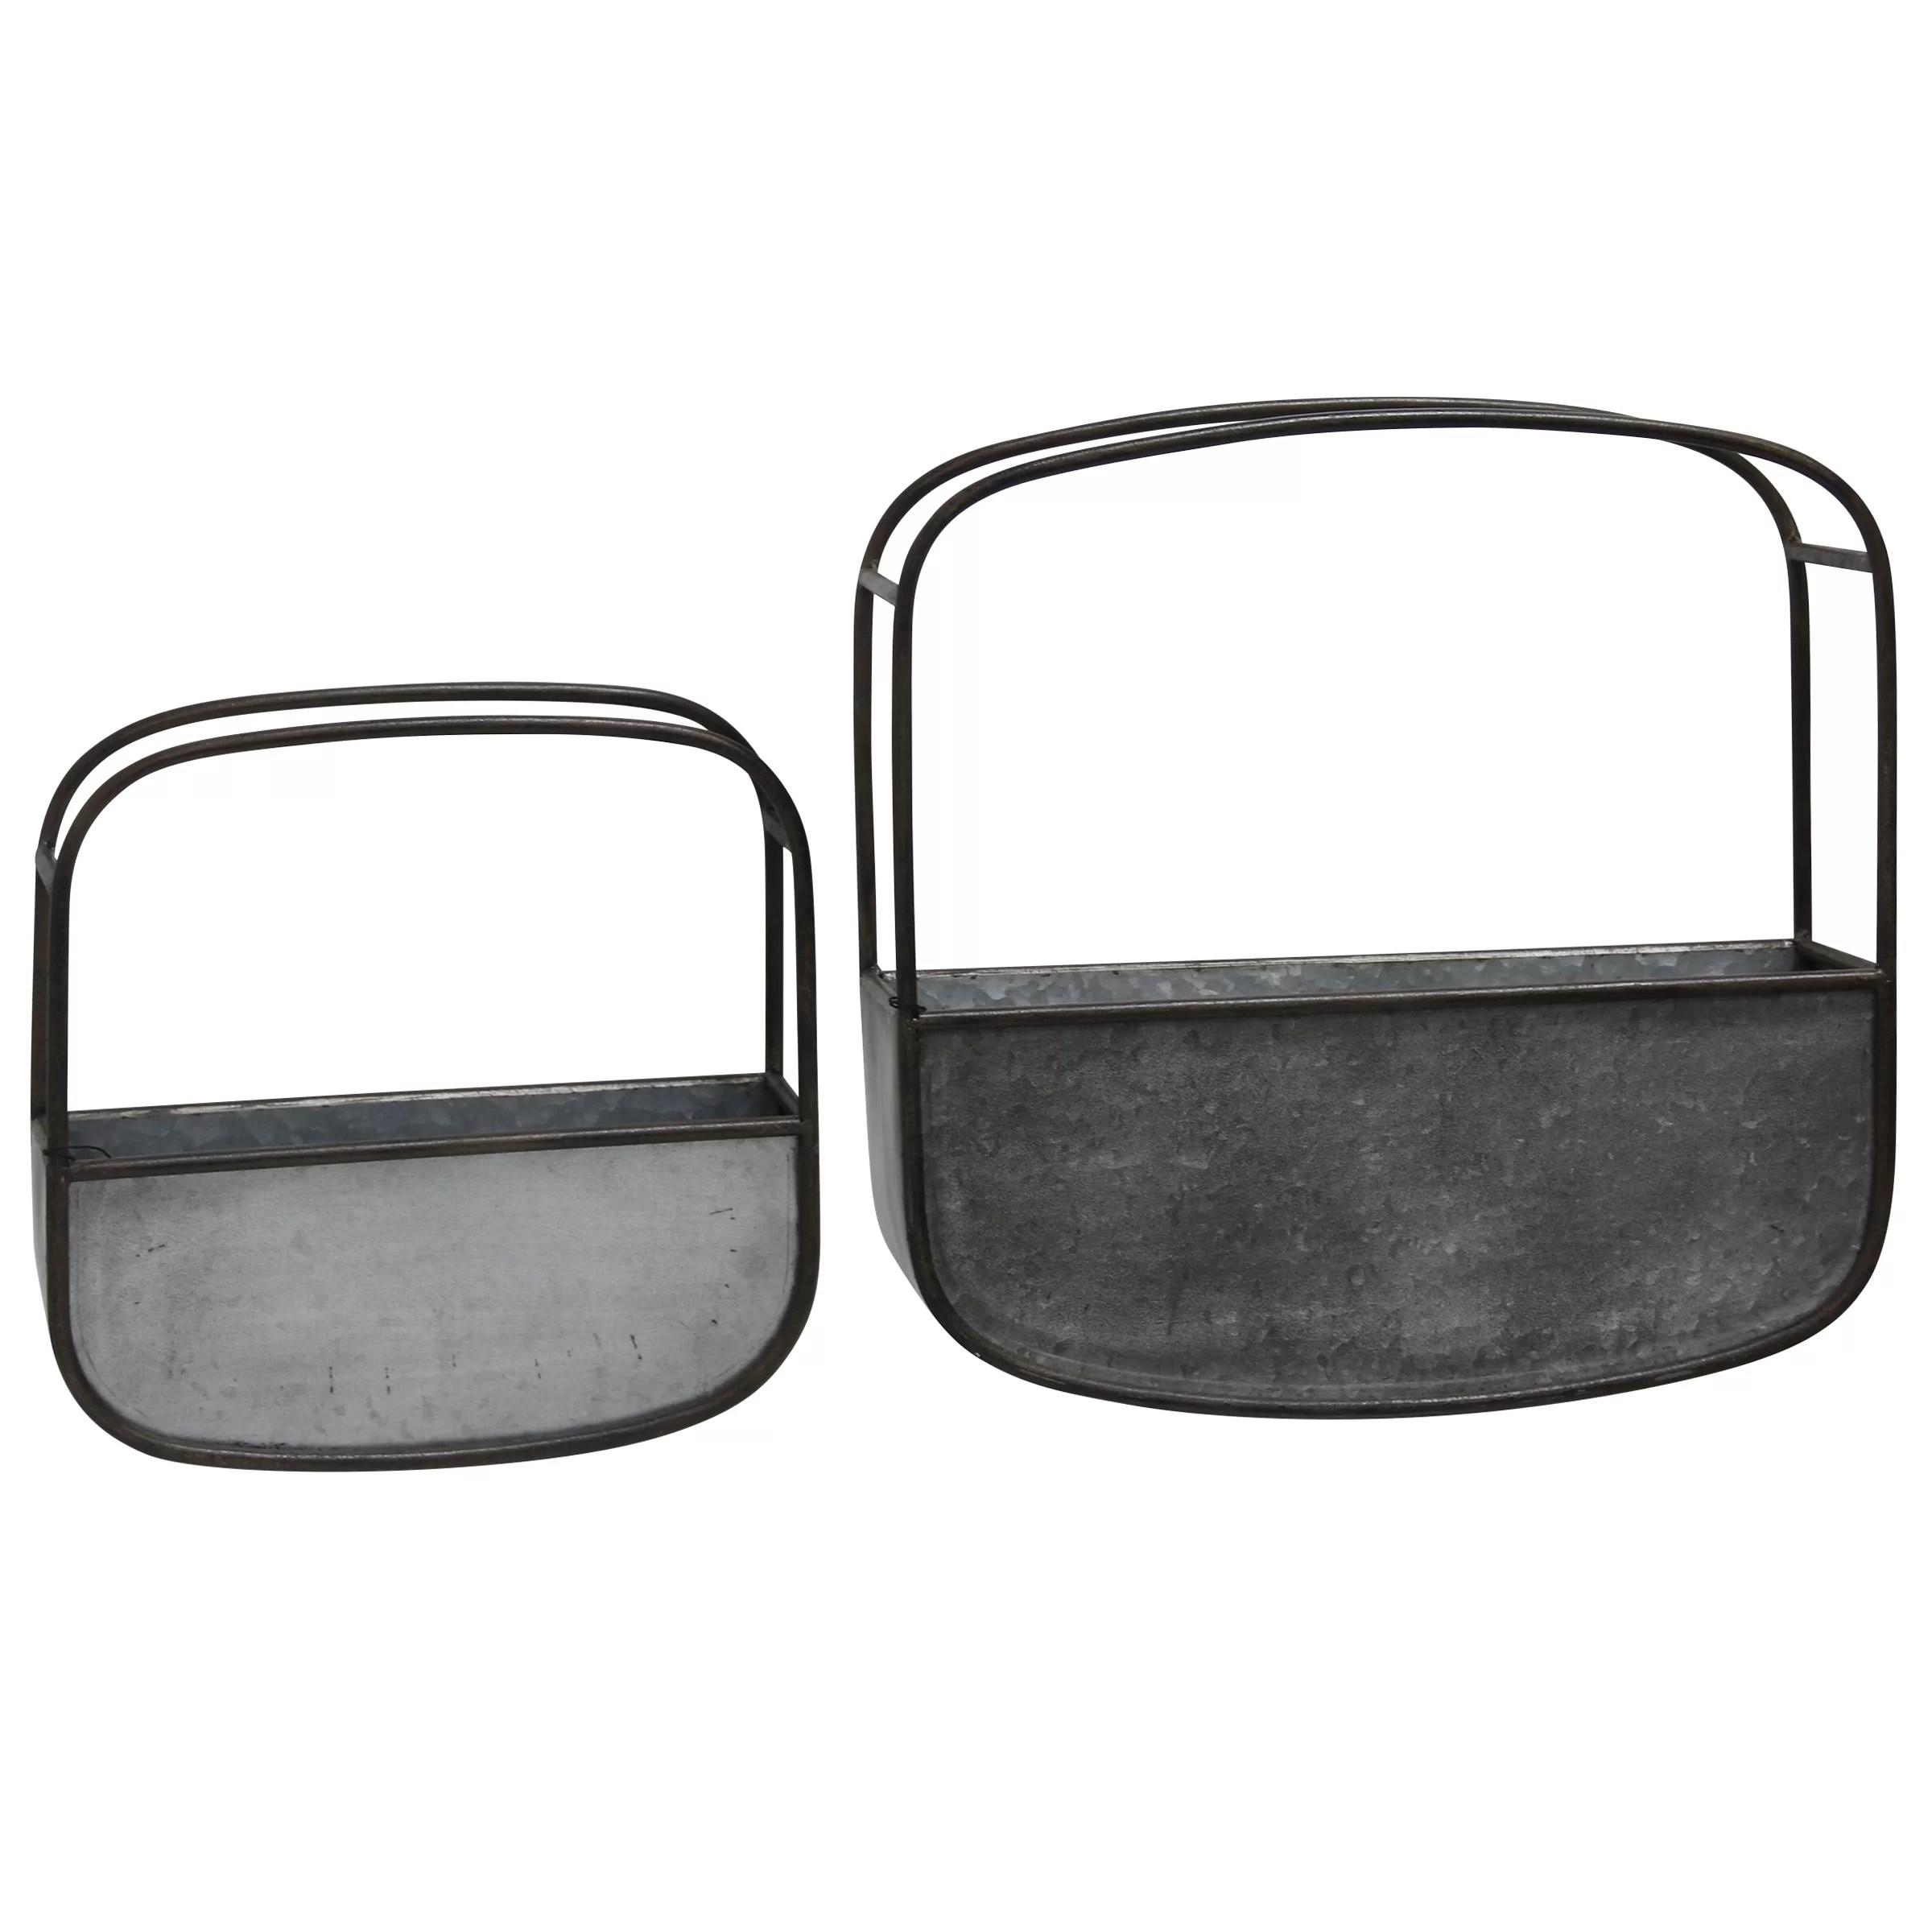 2 Piece Metal Wall Baskets Wall Decor Set